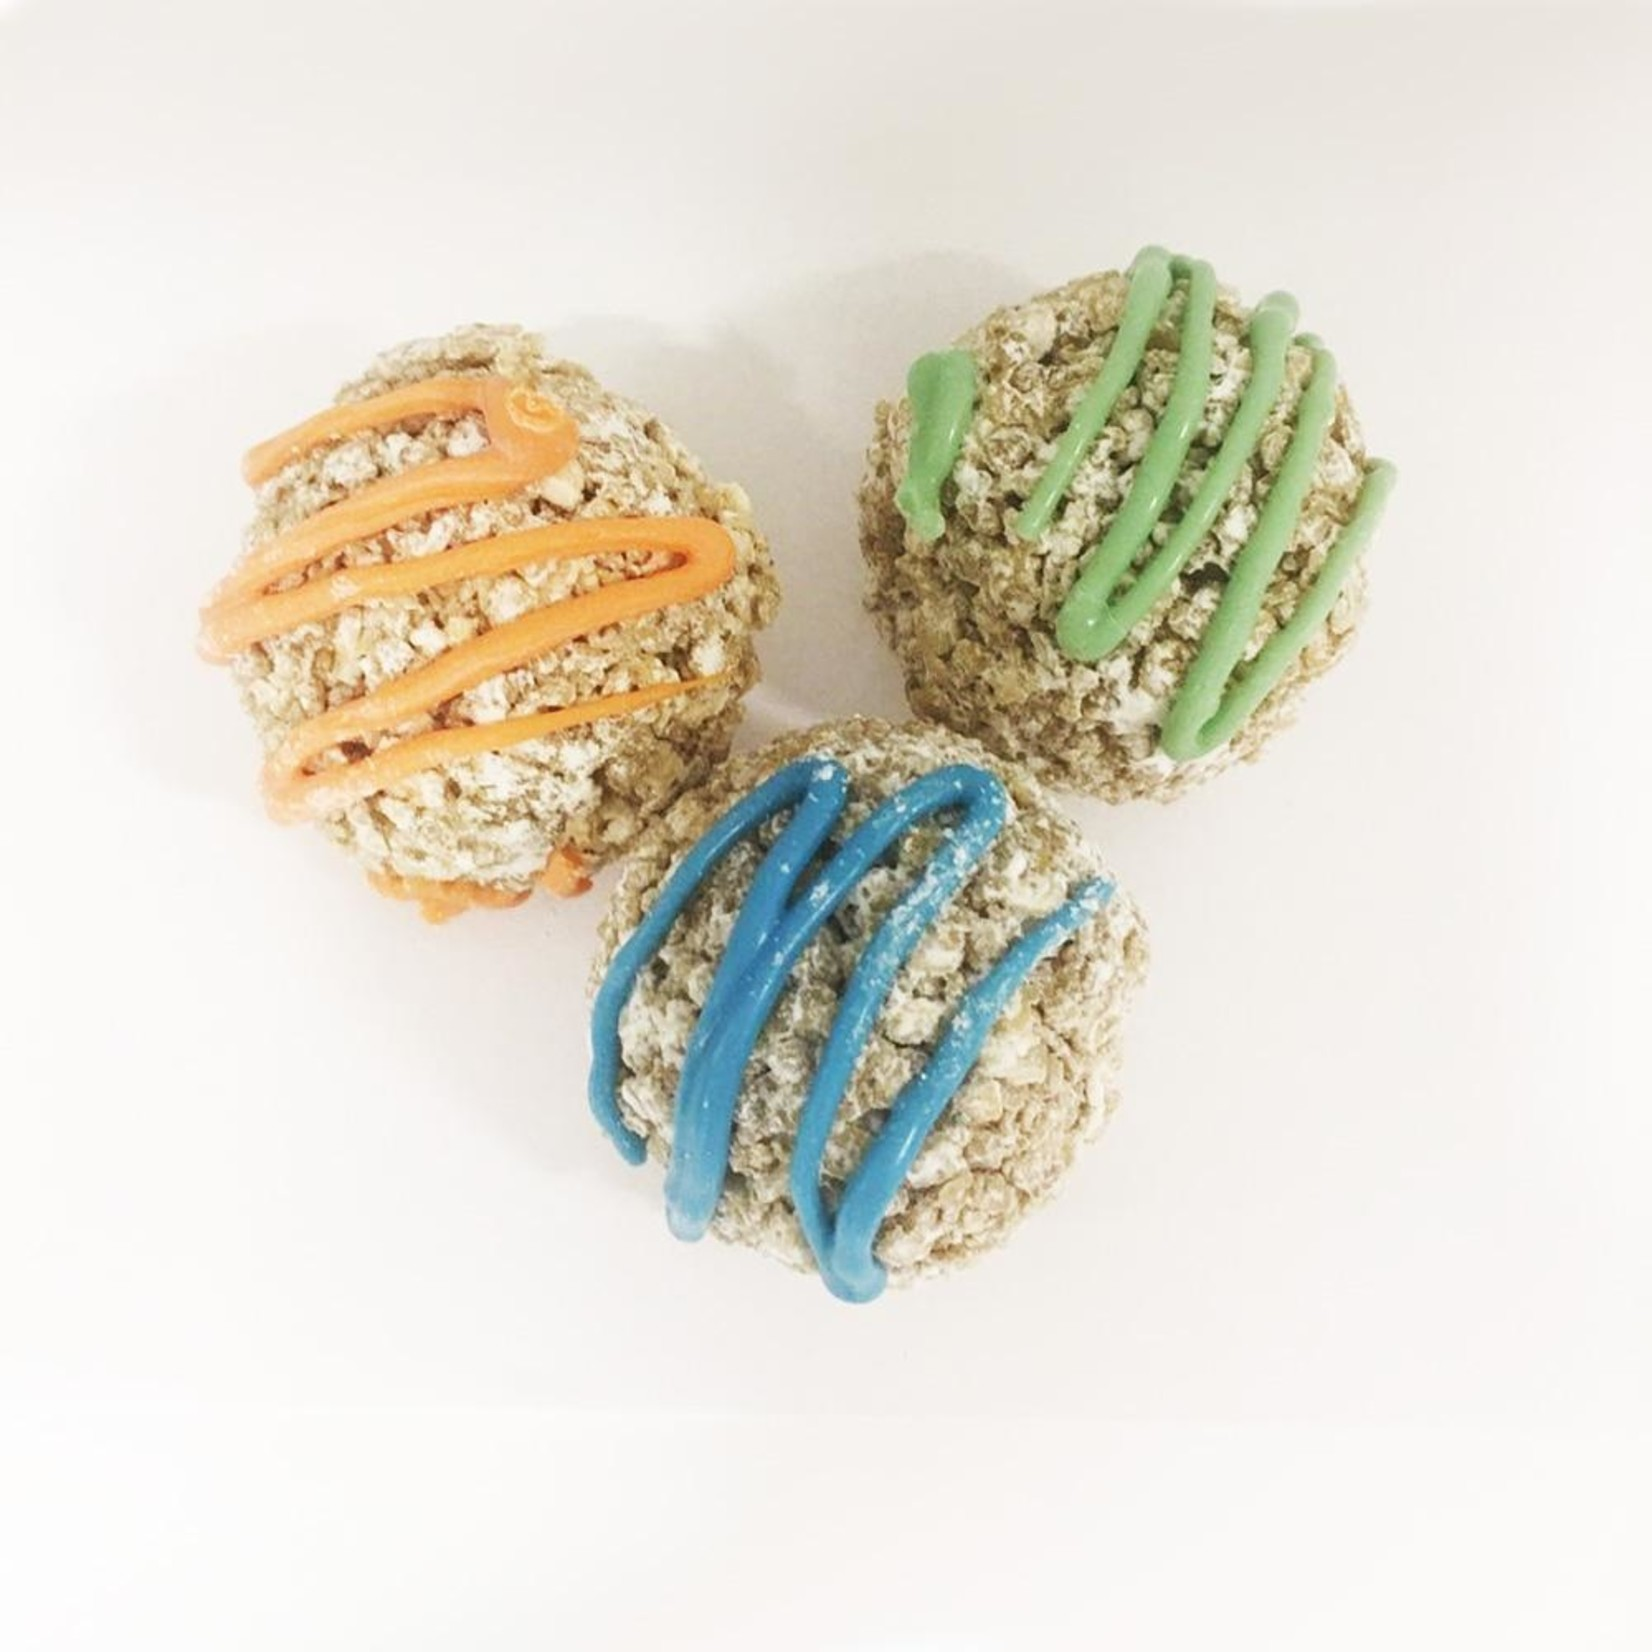 K9 Granola Factory K9 Granola Factory Donut Holes Powdered Sugar & Yogurt Dog Treats 10ct